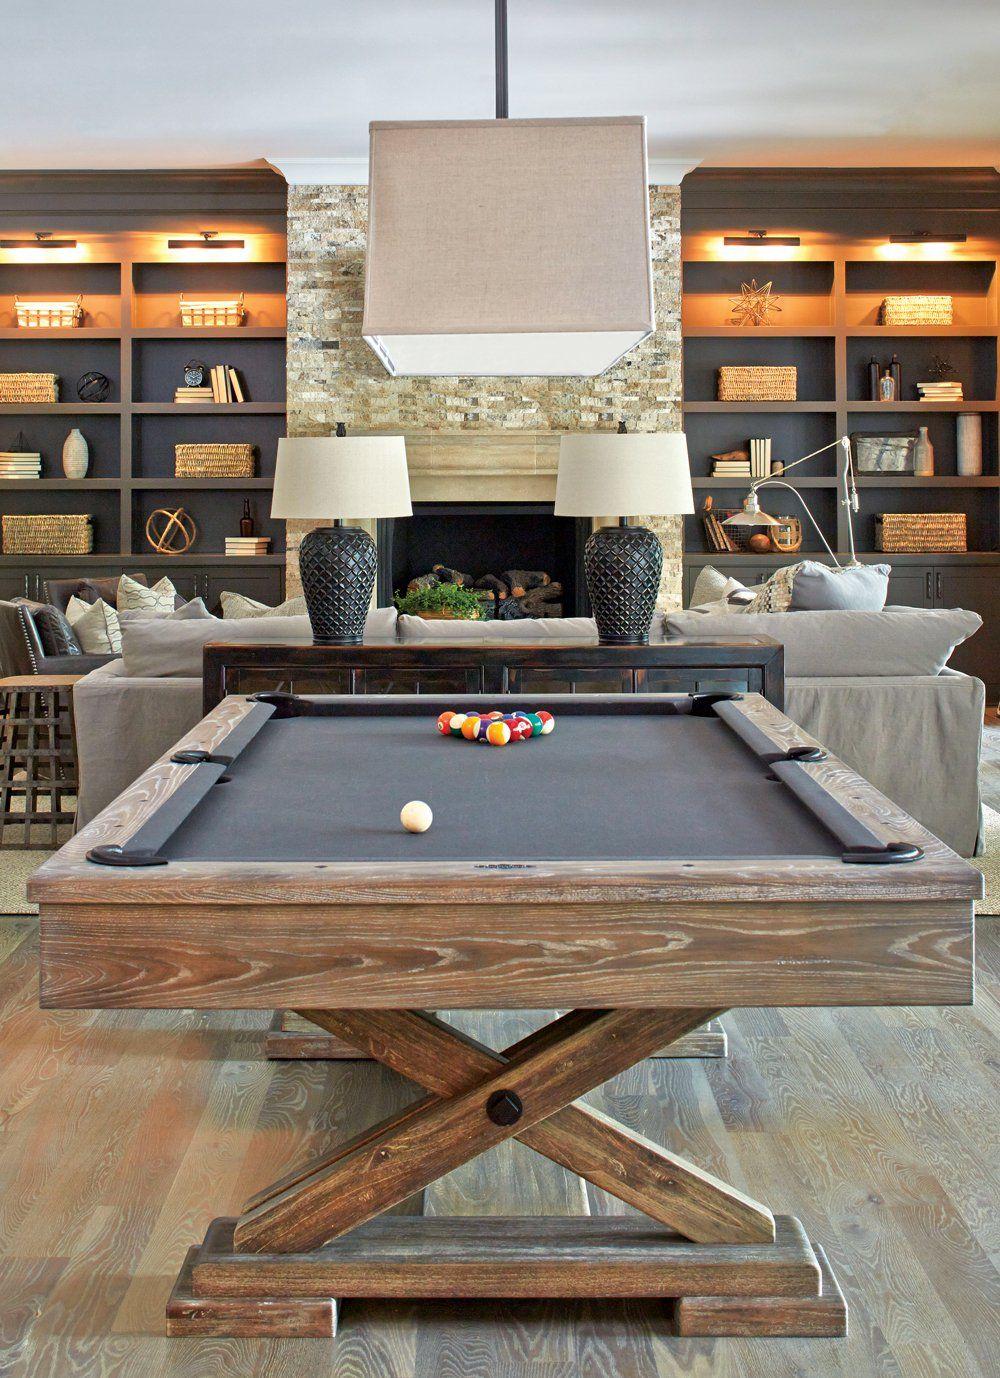 1000 images about billiard s rooms on pinterest billiard room - Best 20 Modern Pool Tables Ideas On Pinterest Pool Table Pool Tables And Pool Billiards Game